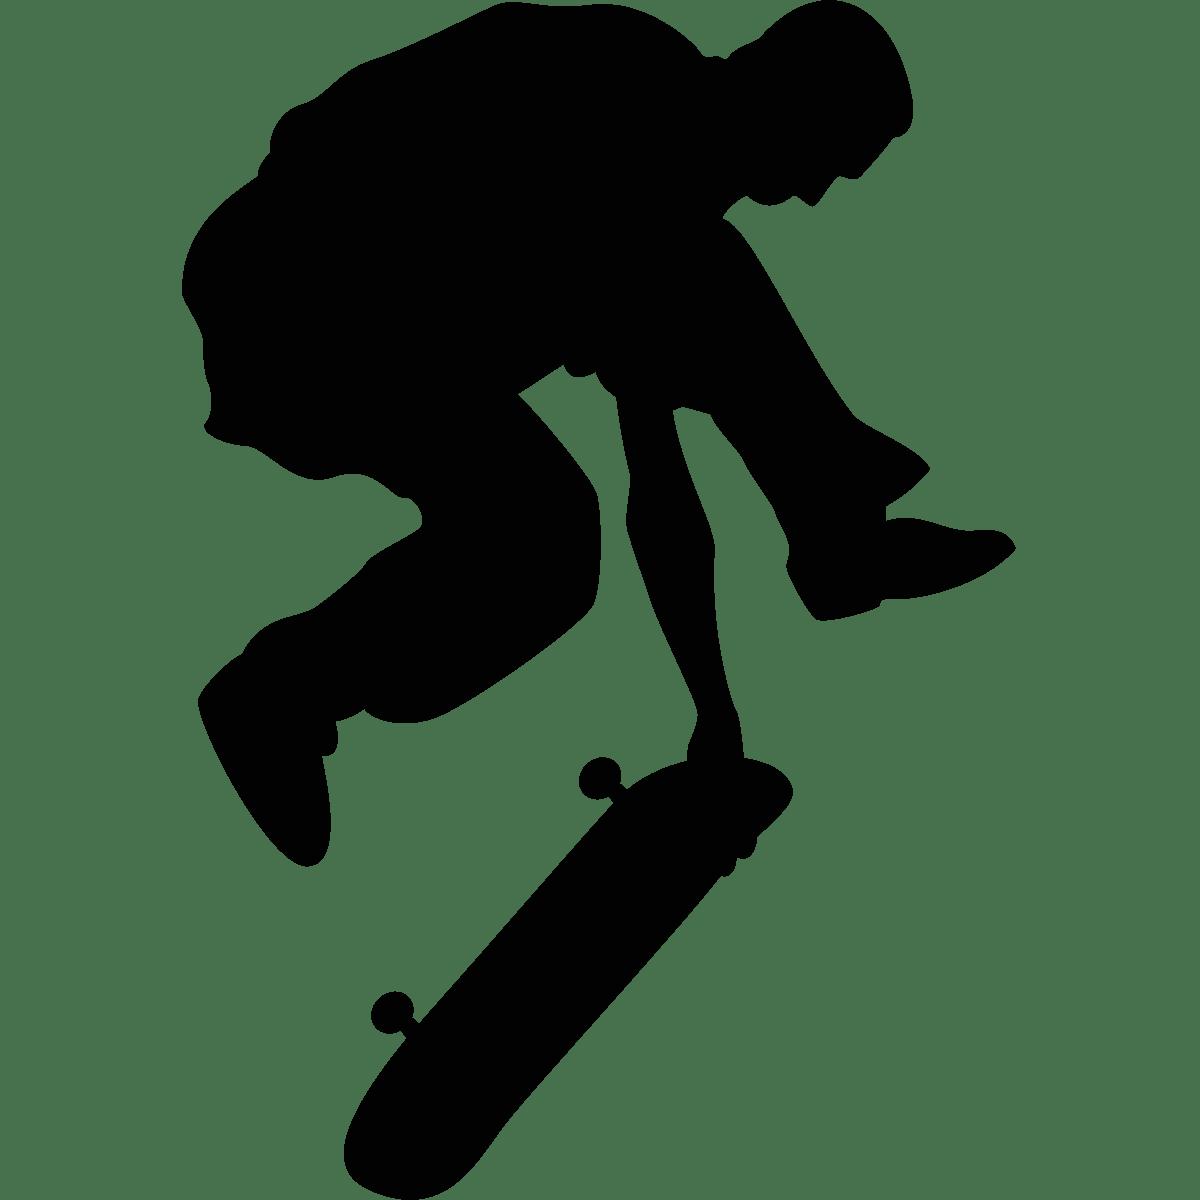 Sticker Skater free style  Stickers Musique  Cinema Silhouettes  ambiancesticker